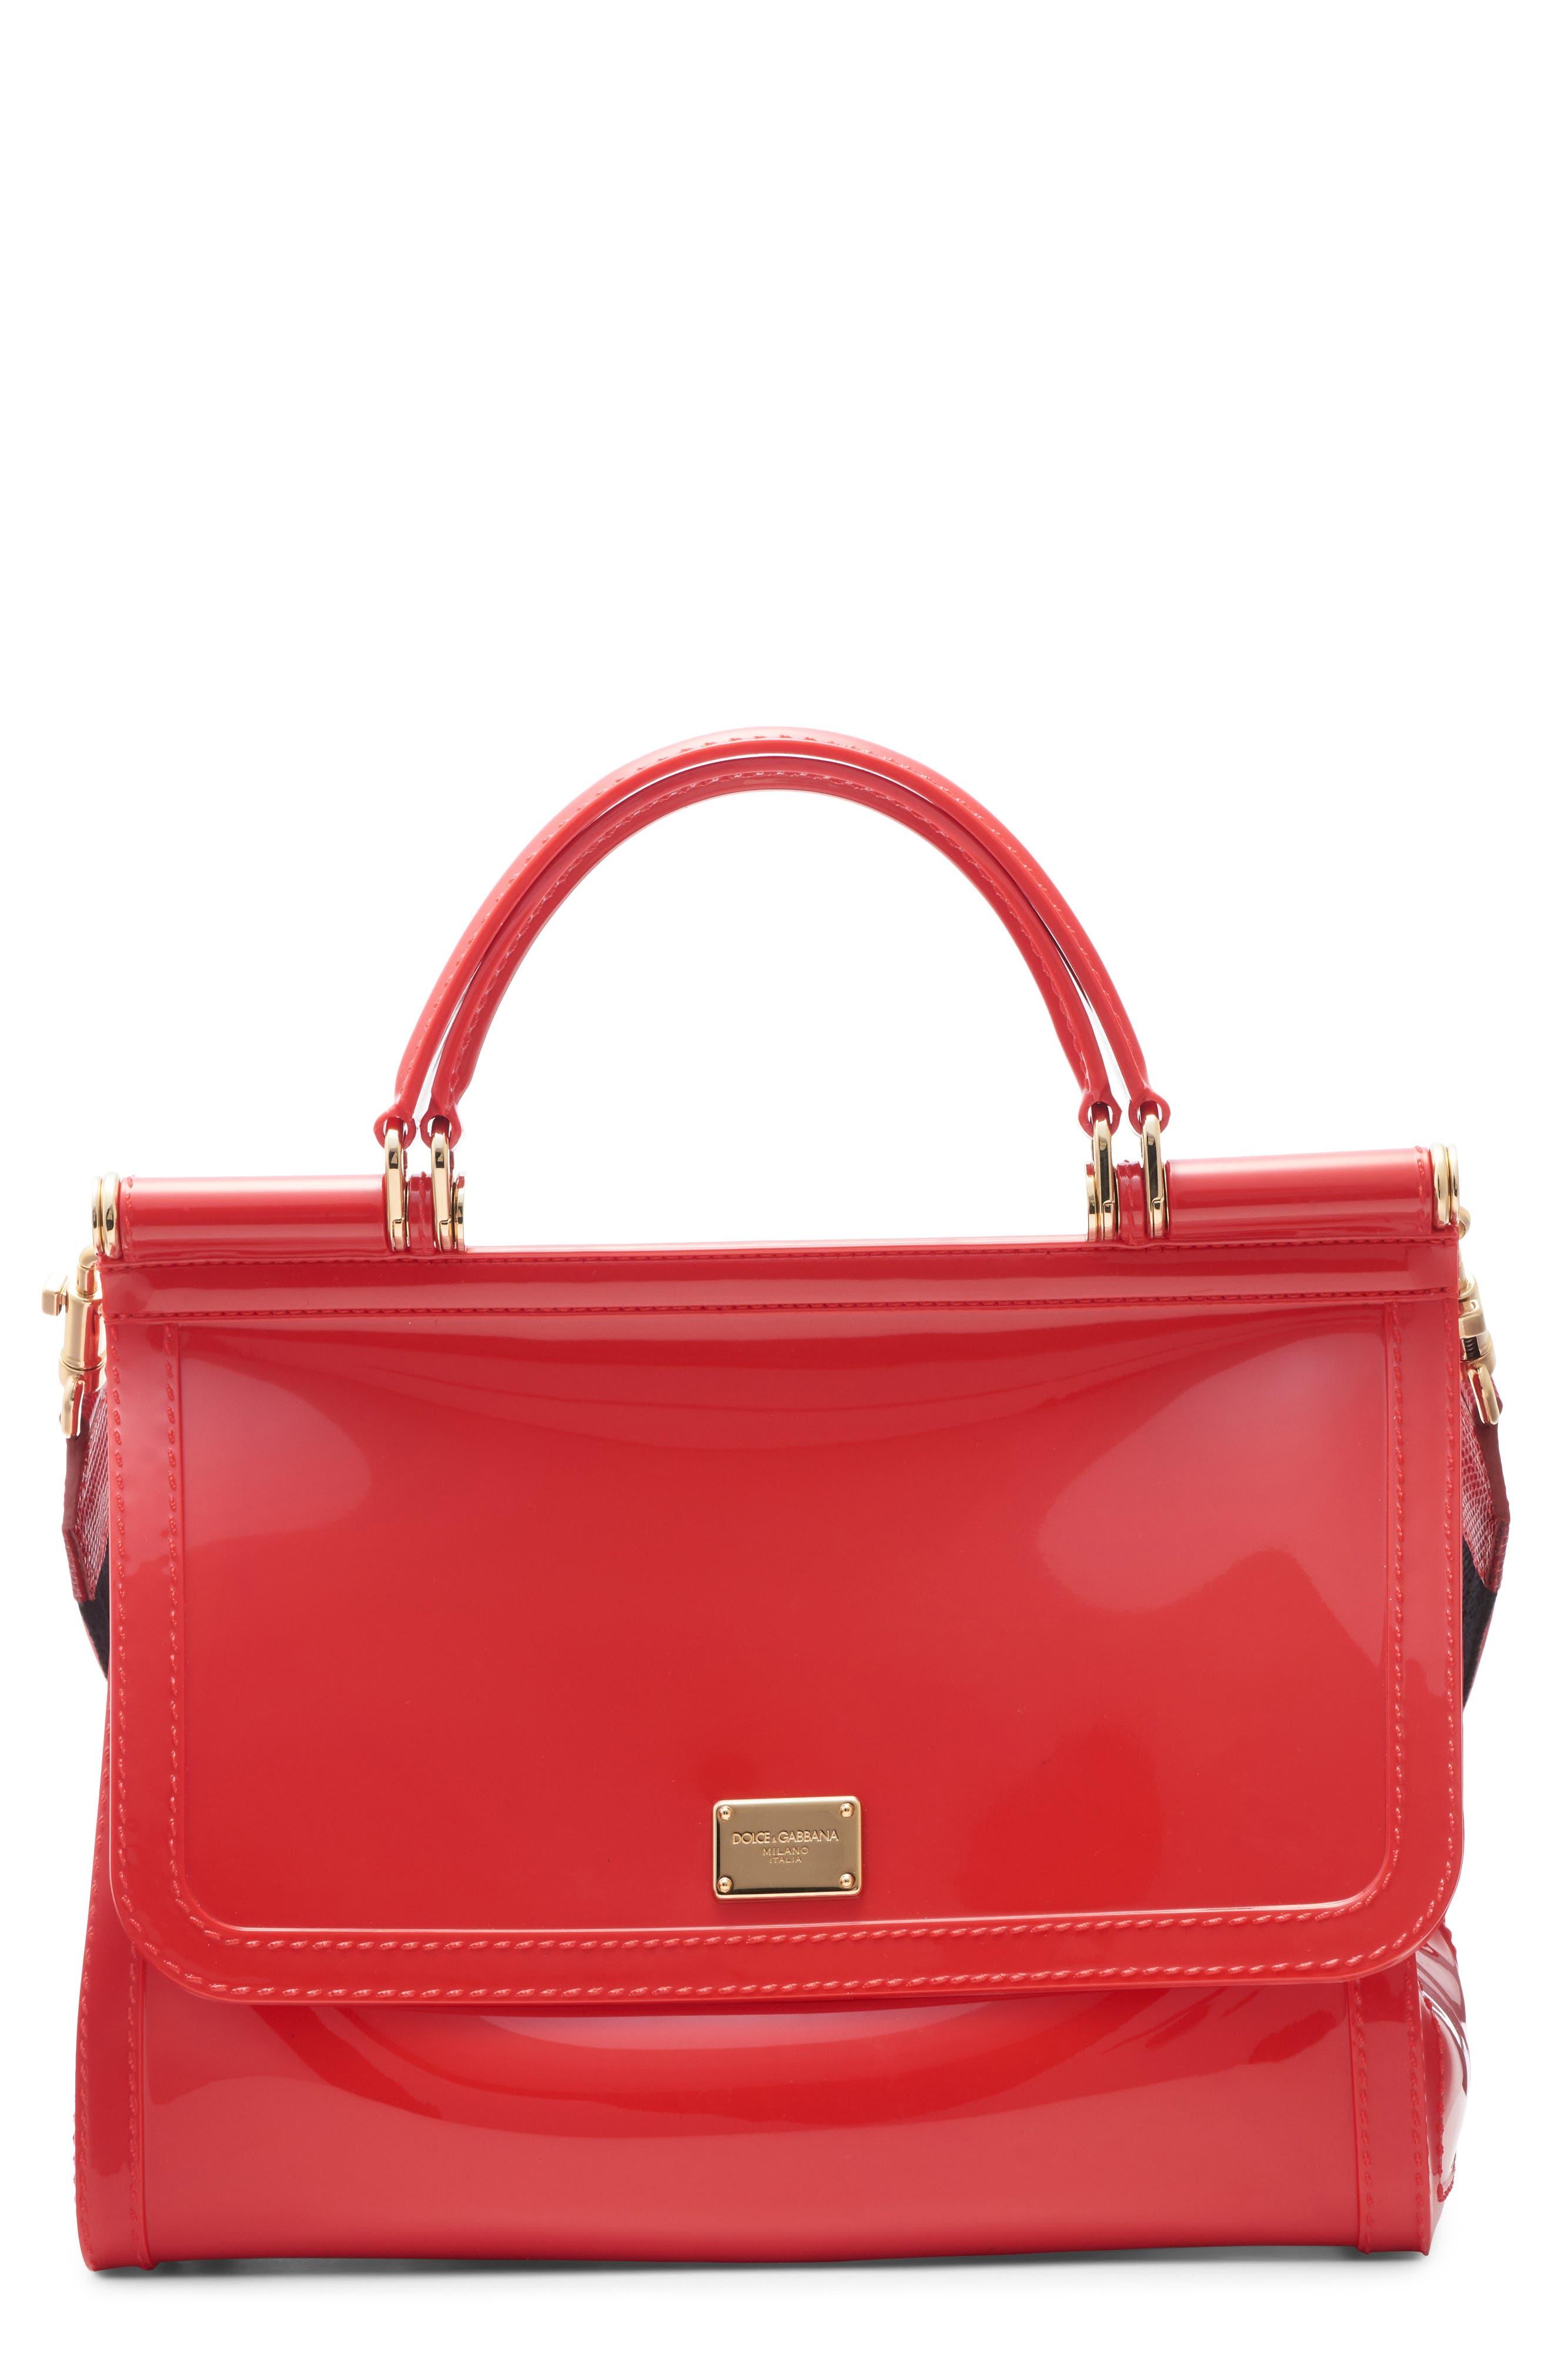 b5678f641fd Women s Dolce Gabbana Designer Handbags   Wallets   Nordstrom